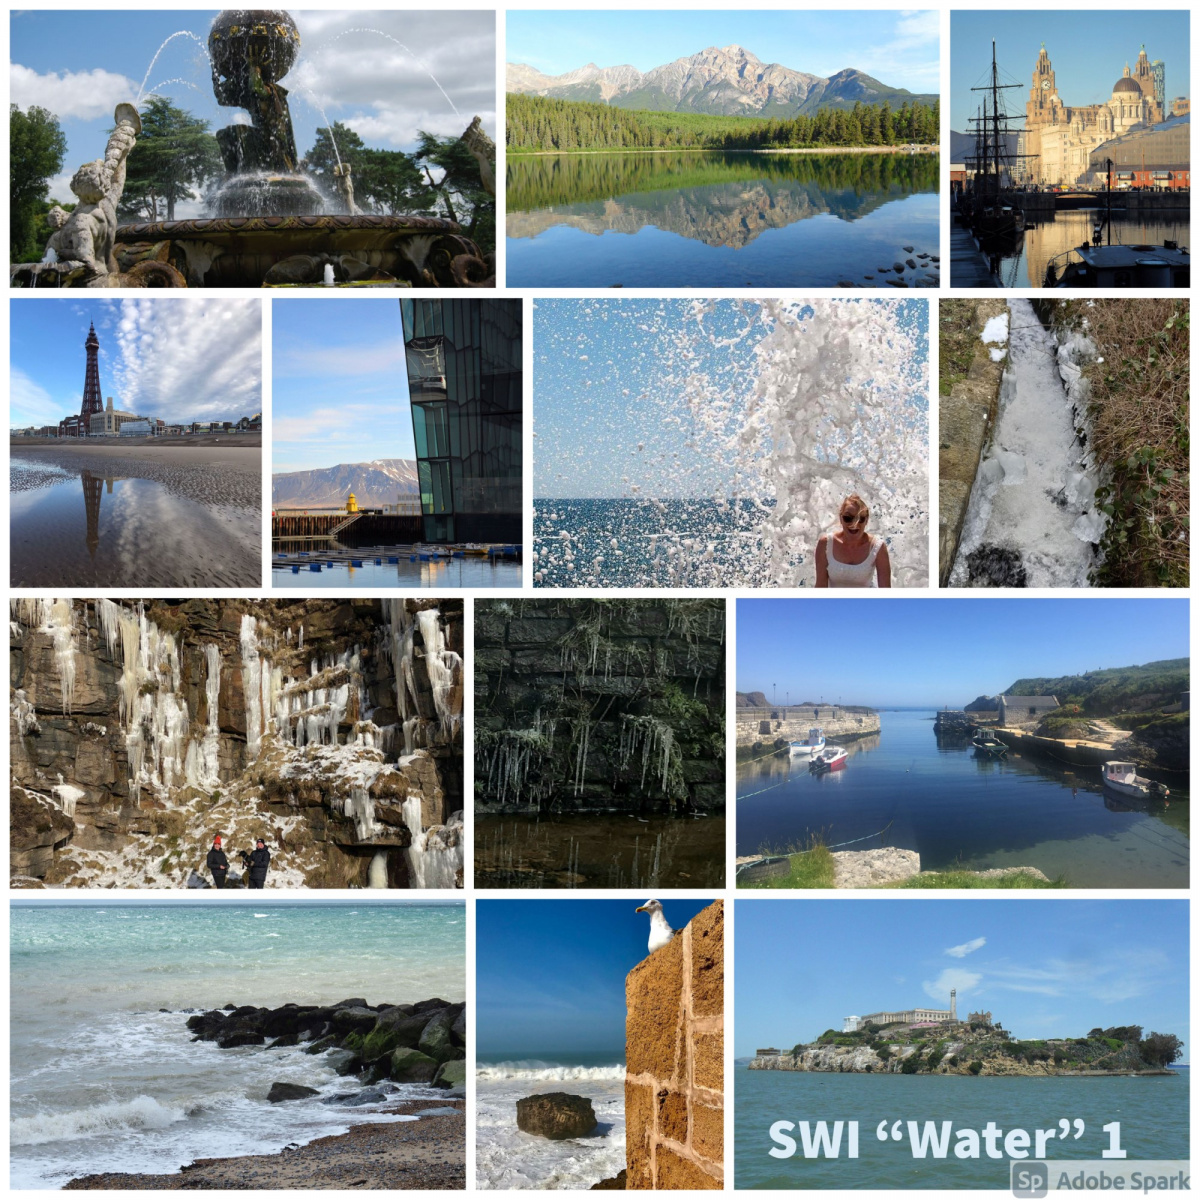 SWI-Water-part1